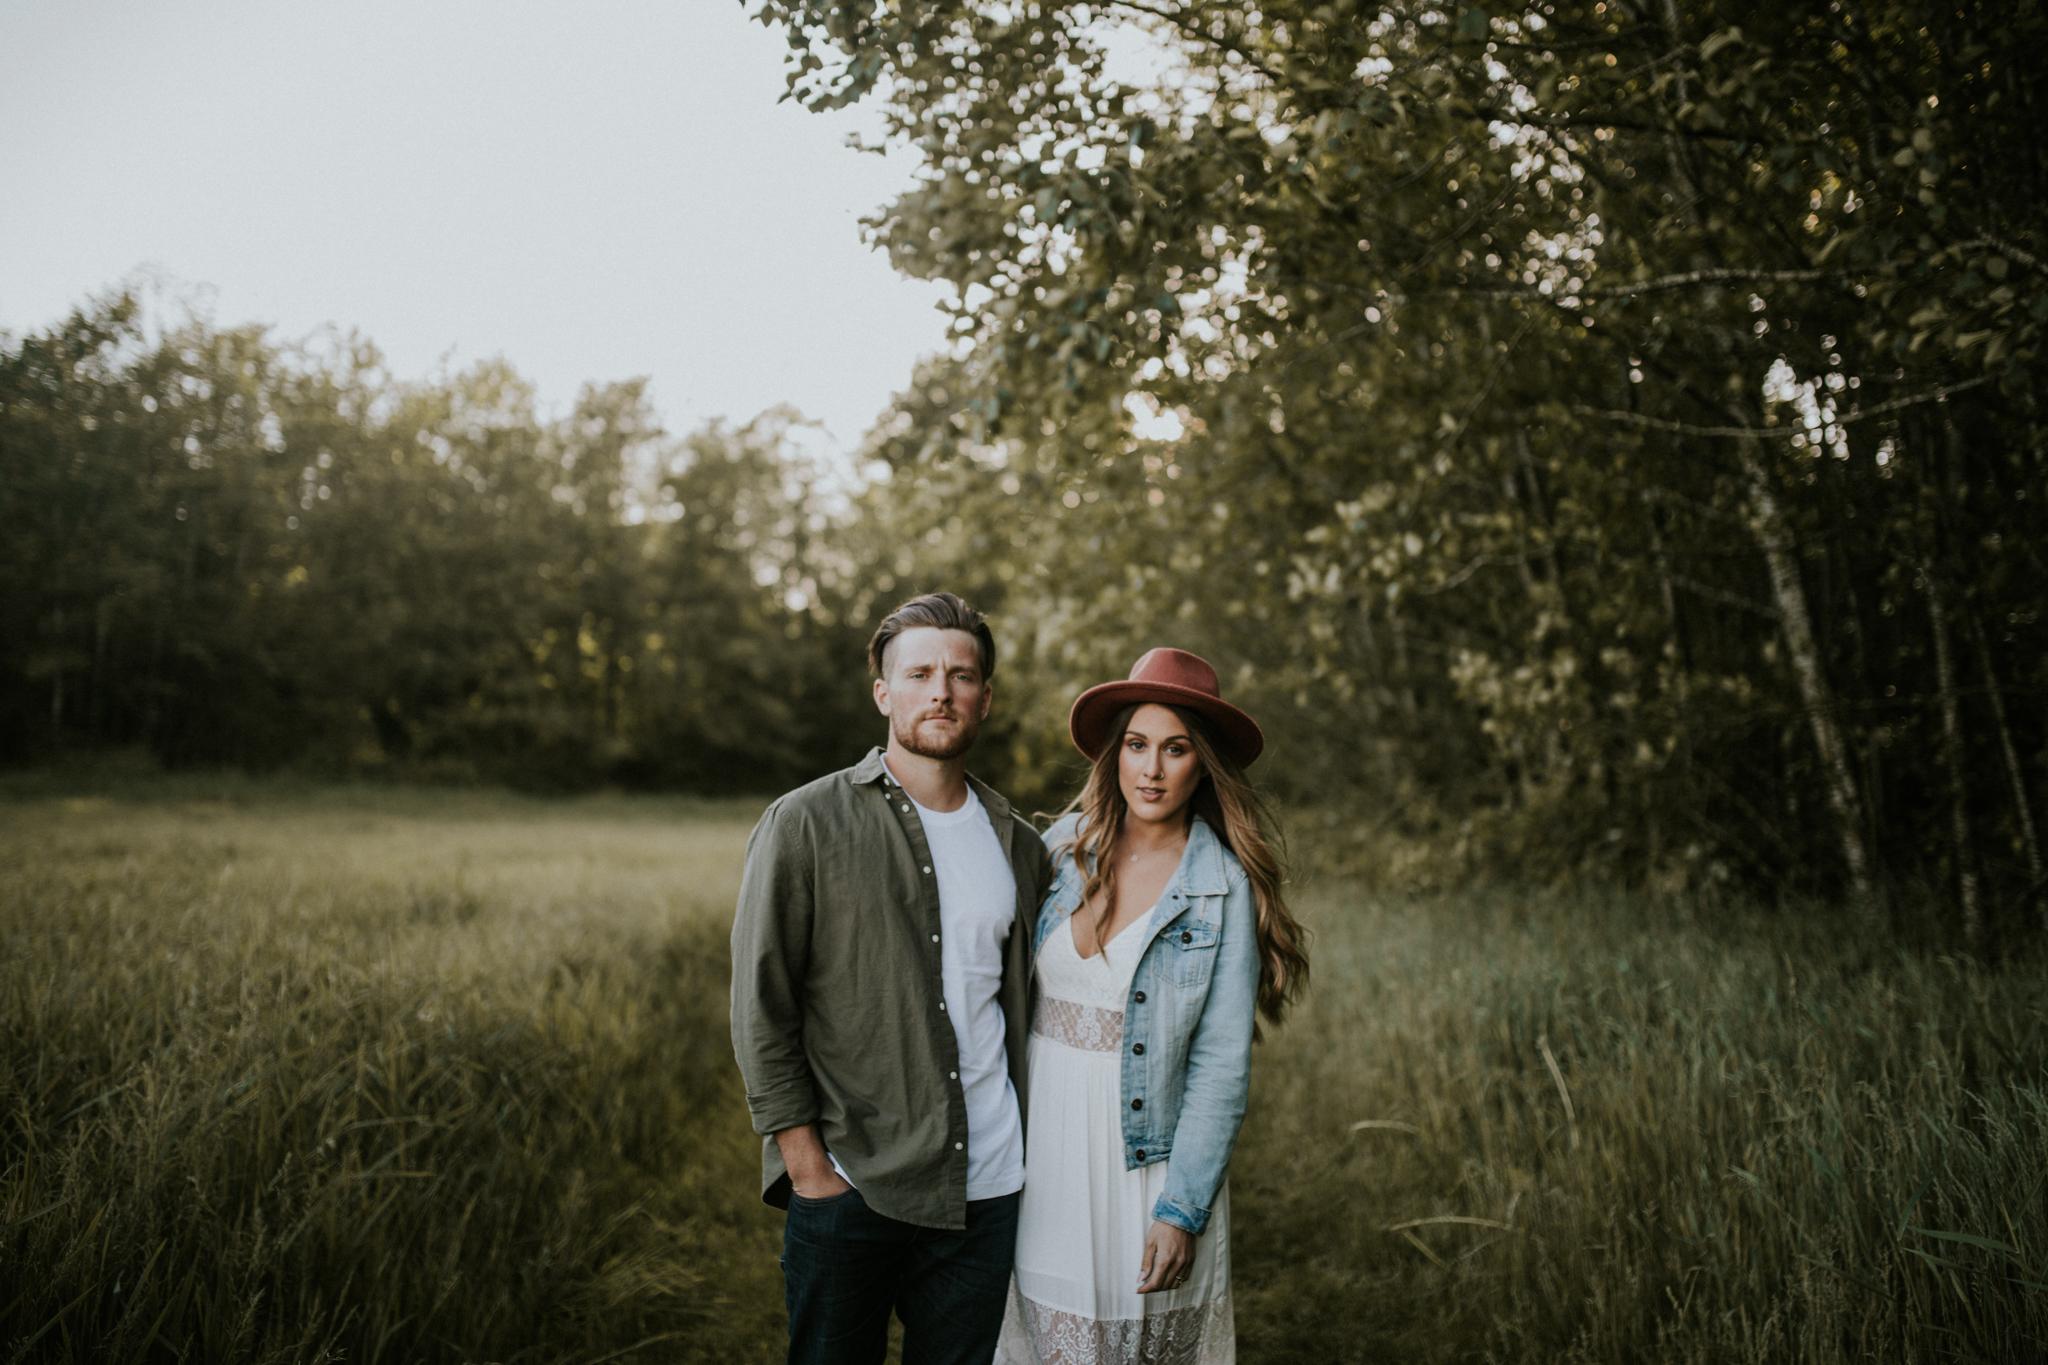 vancouver_wedding_engagement_photographer_004.JPG